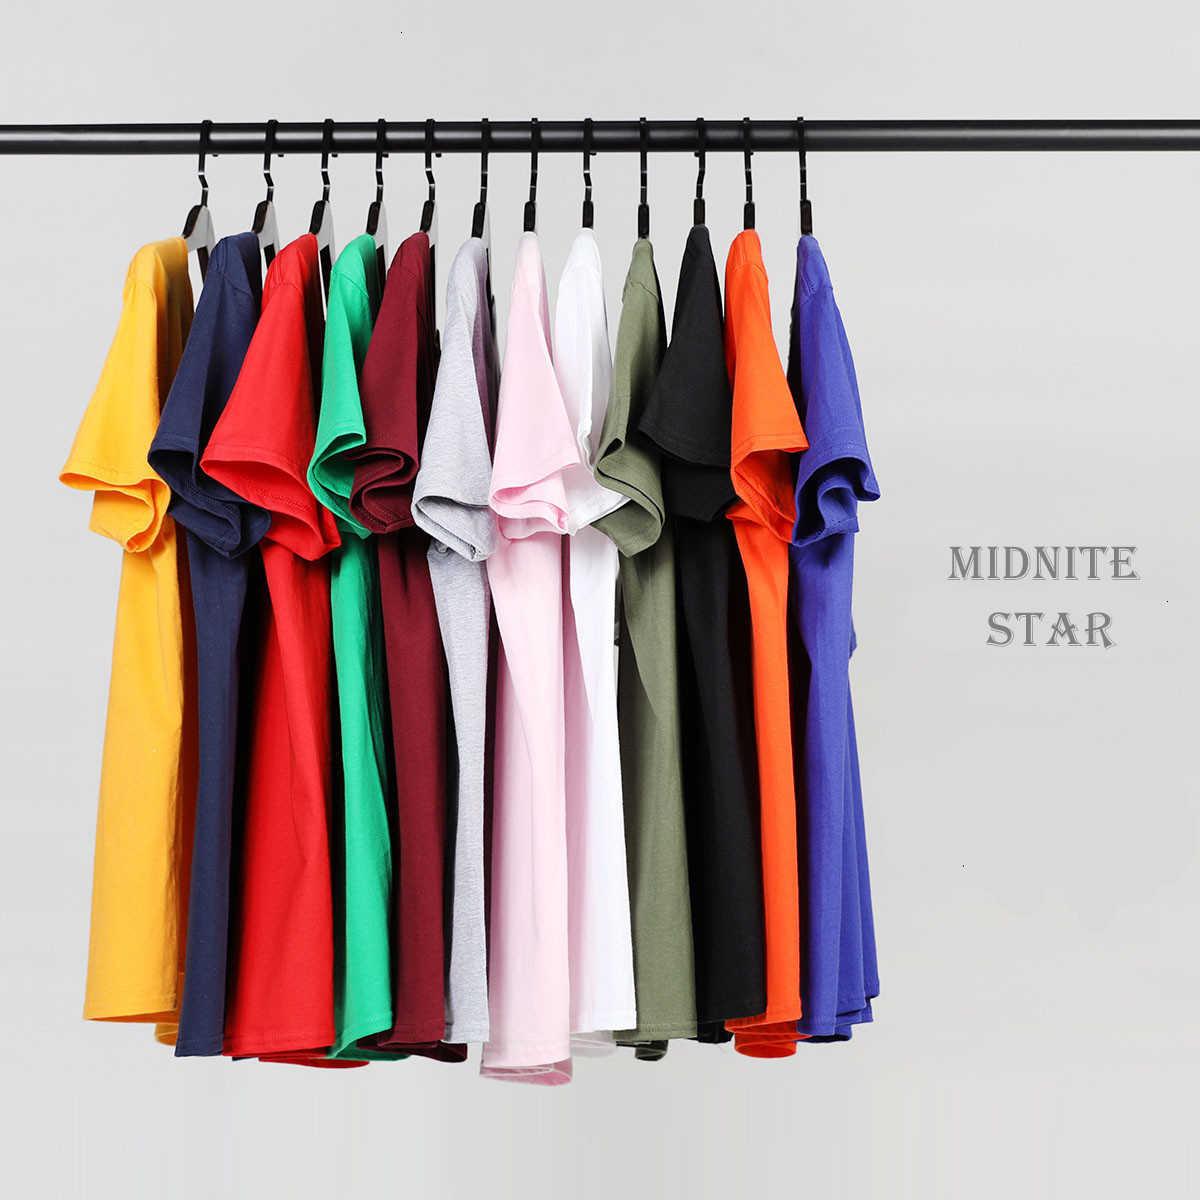 Midnite Bintang Mesir Beetle Kaos Hitam dengan Merah Sayap dan Katun Putih dengan Kuning T-shirt